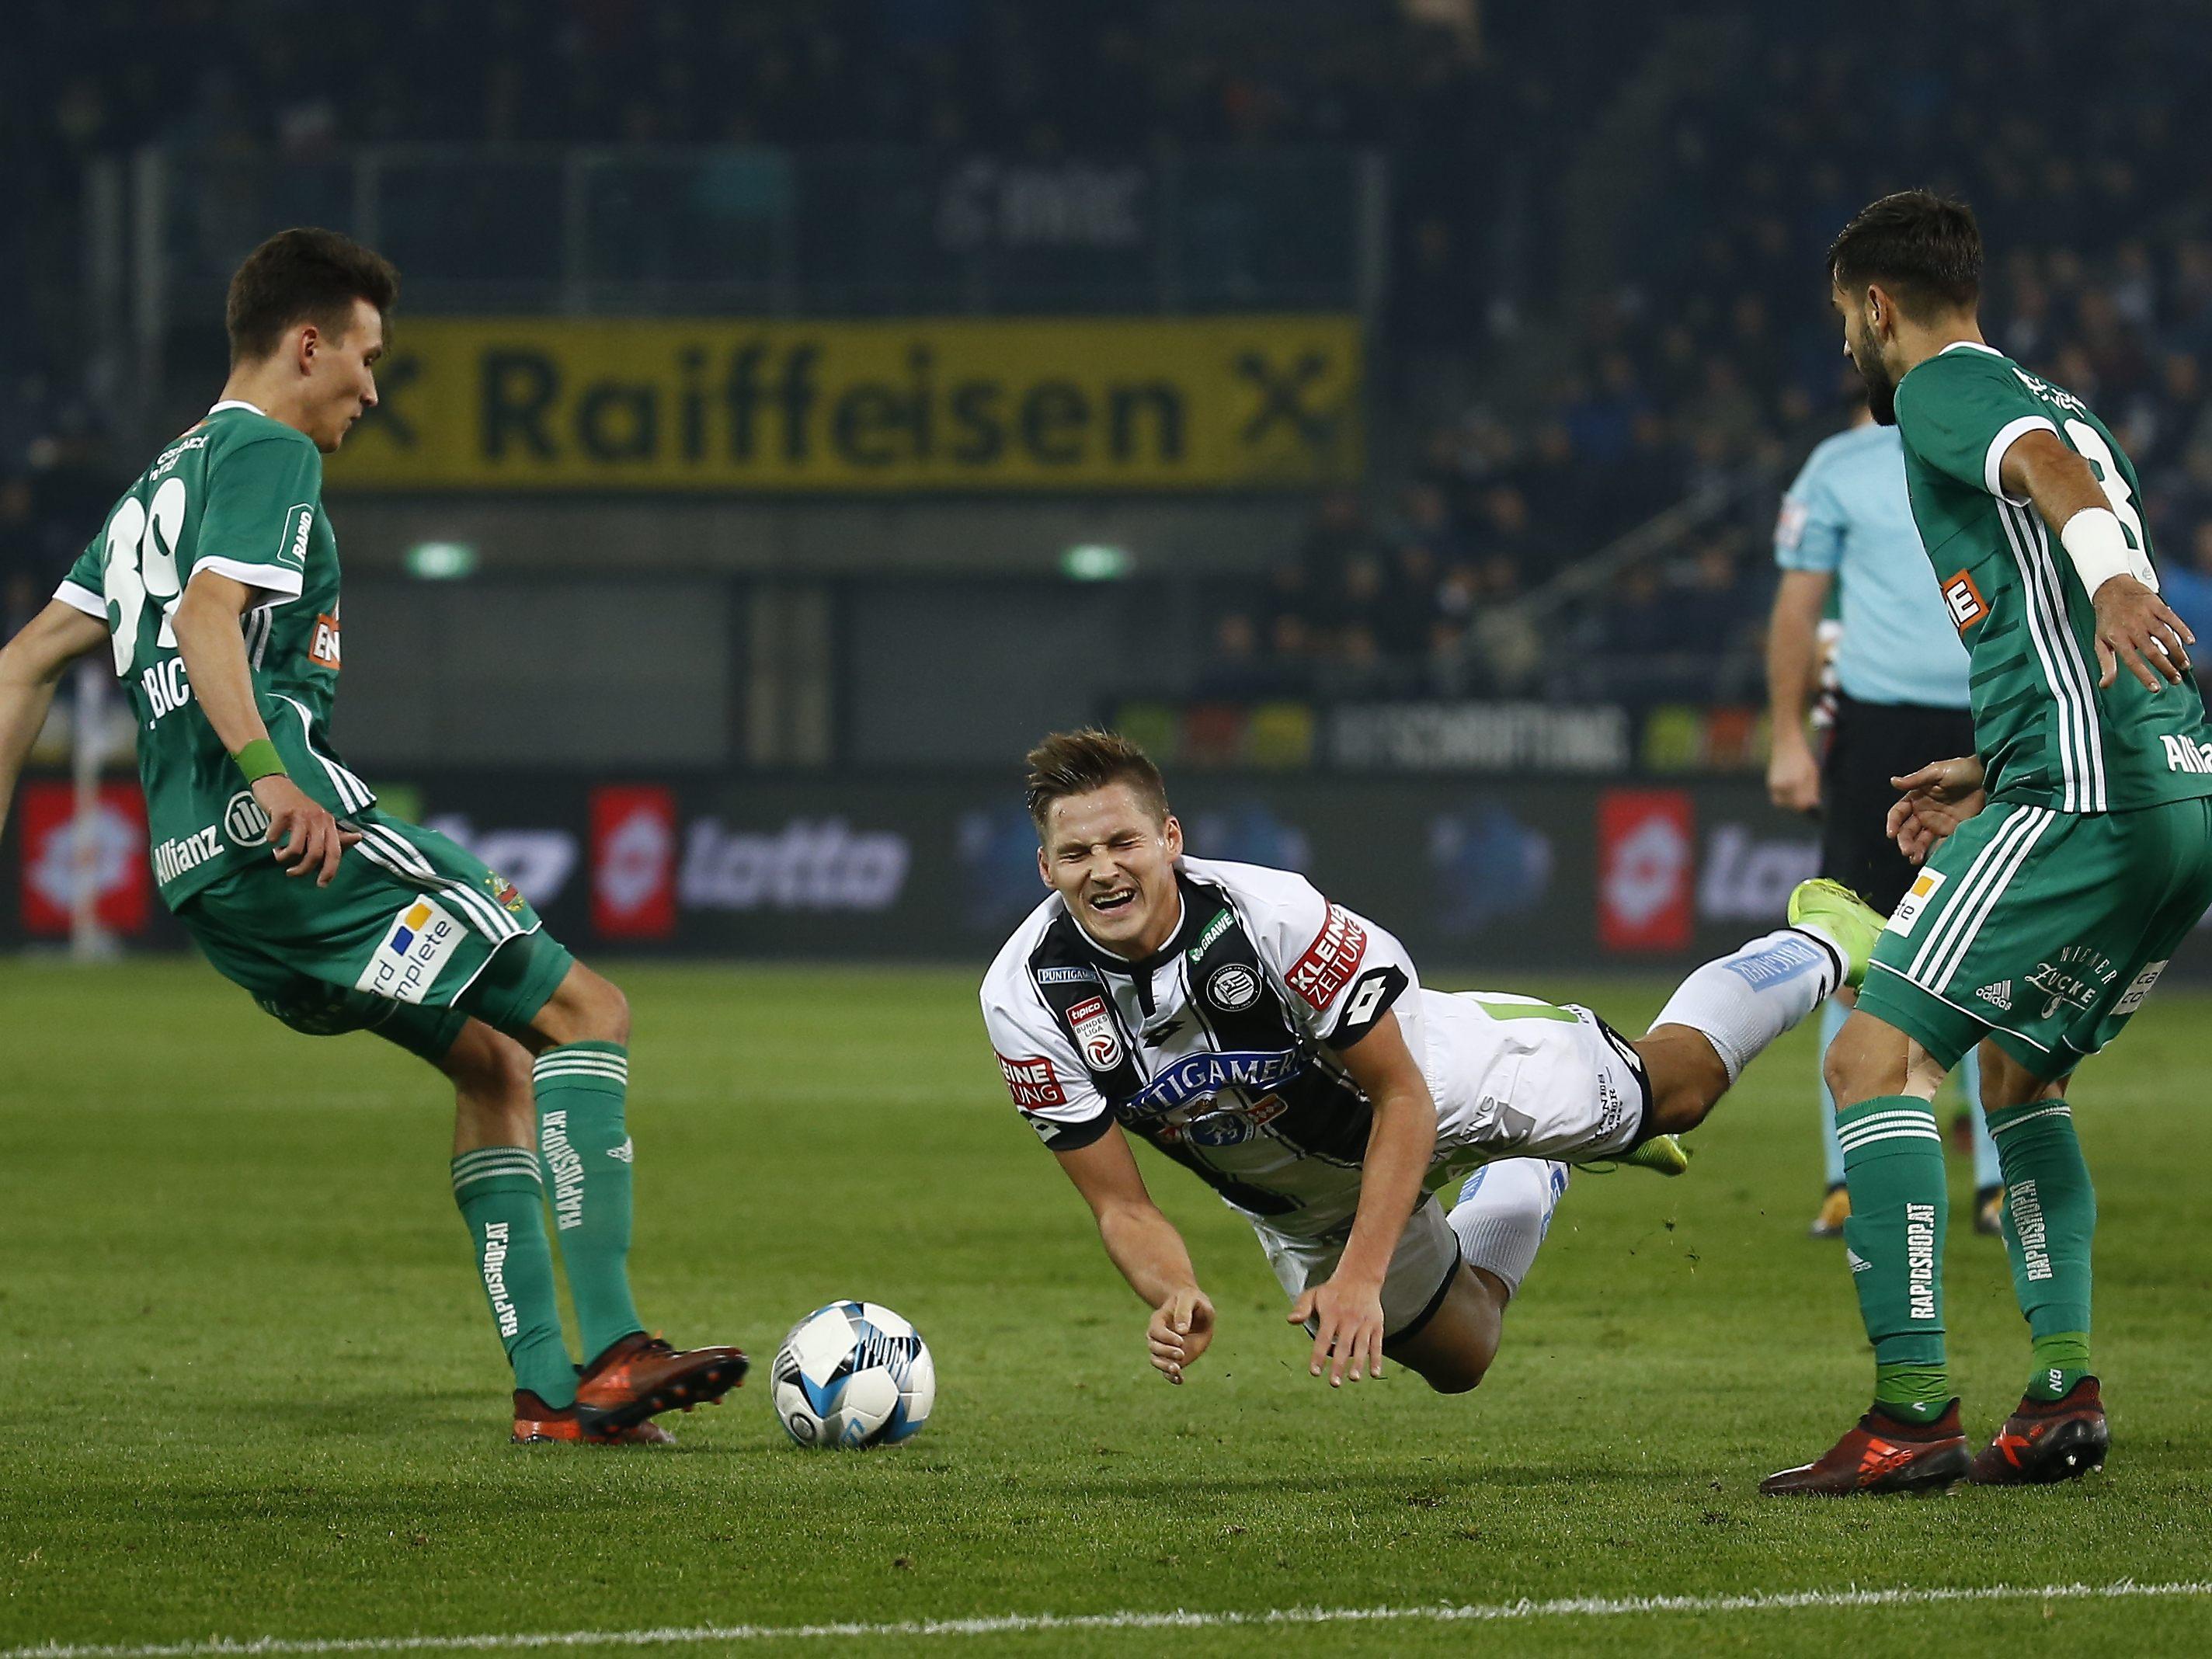 Jetzt Live Sk Rapid Wien Gegen Sk Sturm Graz Im Ticker Wien Fussball Vienna At